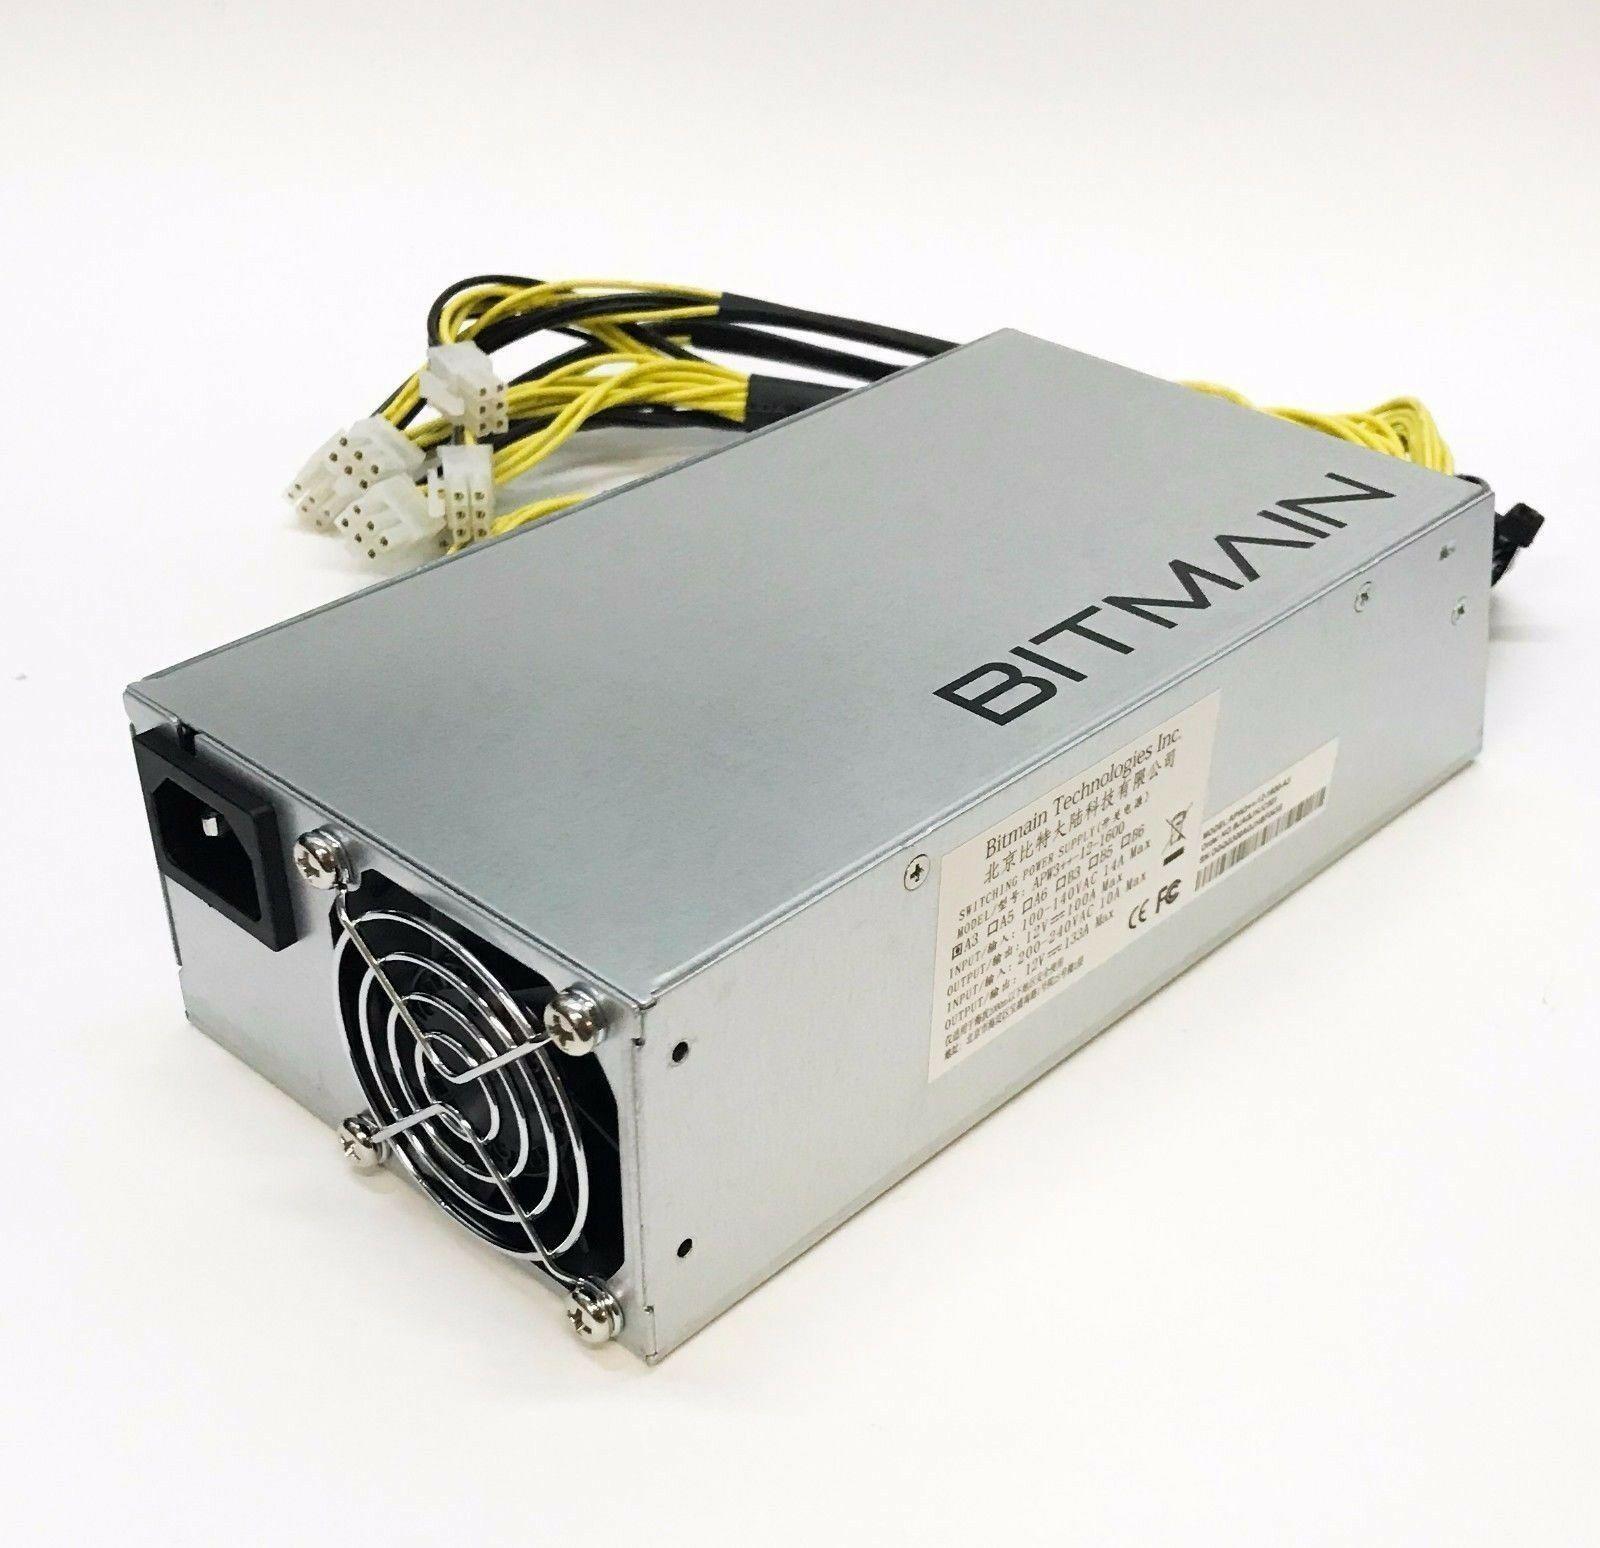 Блок питания Bitmain APW 3++ 1600 Вт